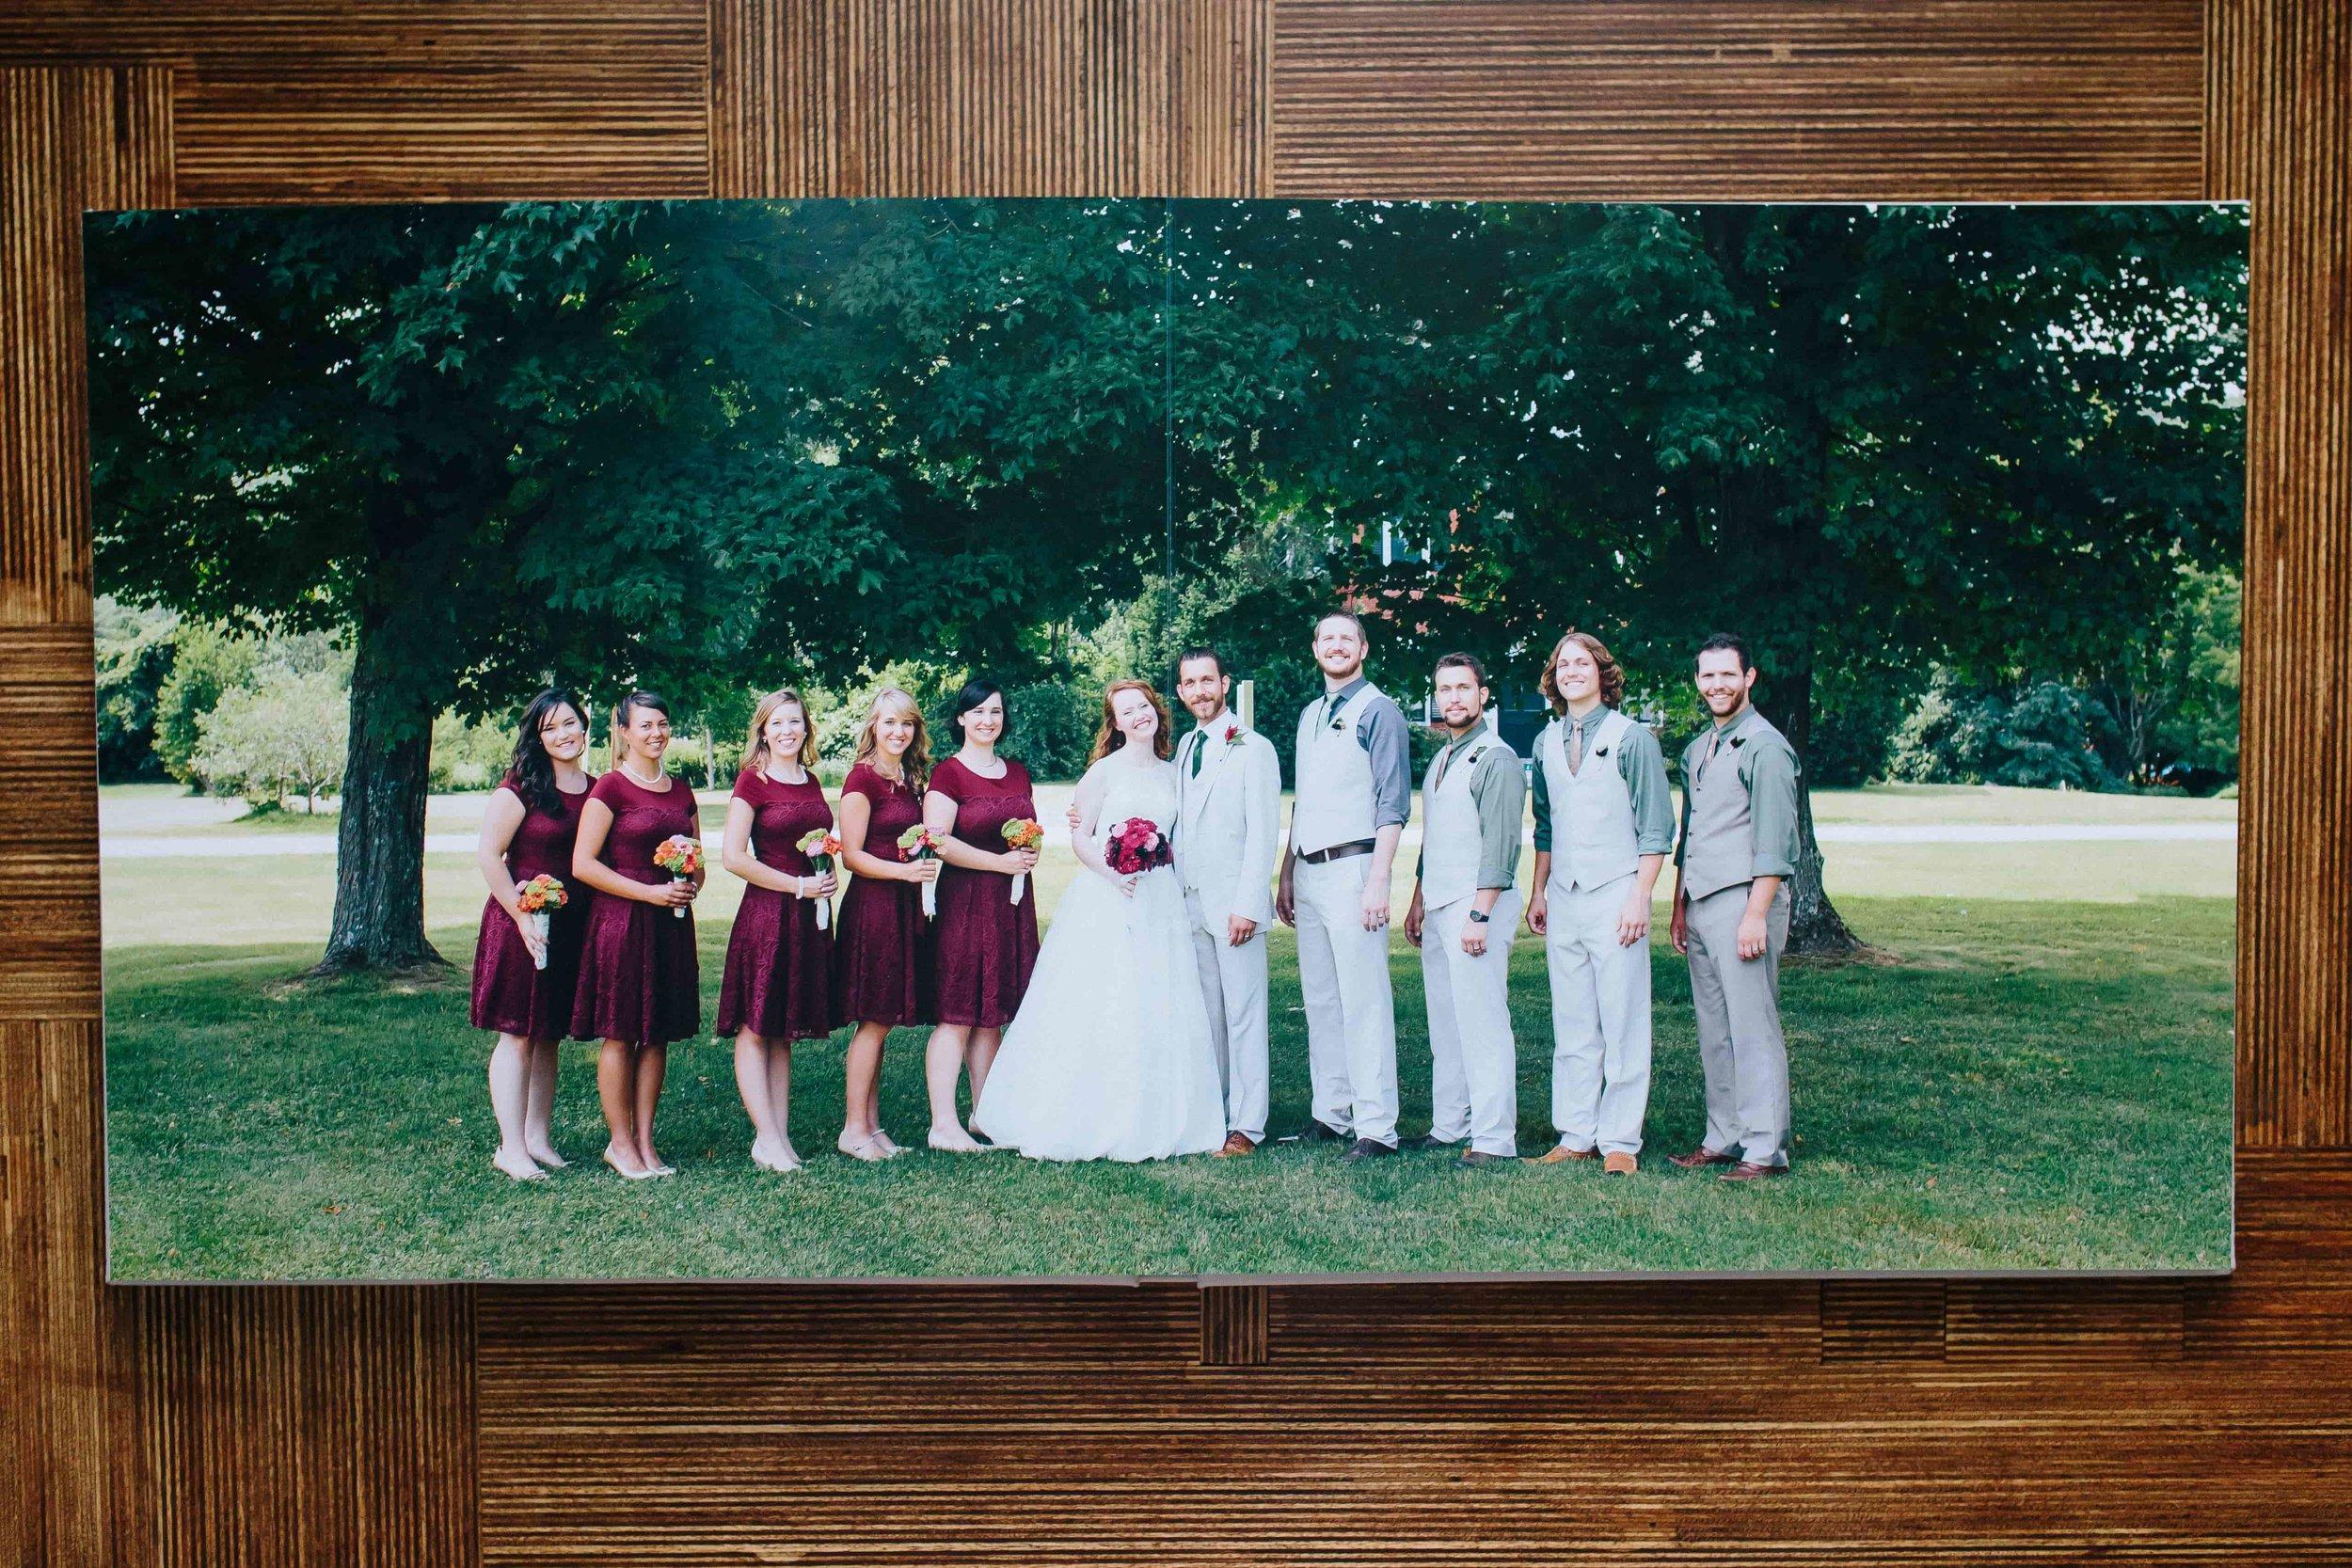 Ashleigh Laureen Photography Journalistic Wedding in New Hampshire, Keepsake Signature Heirloom Album